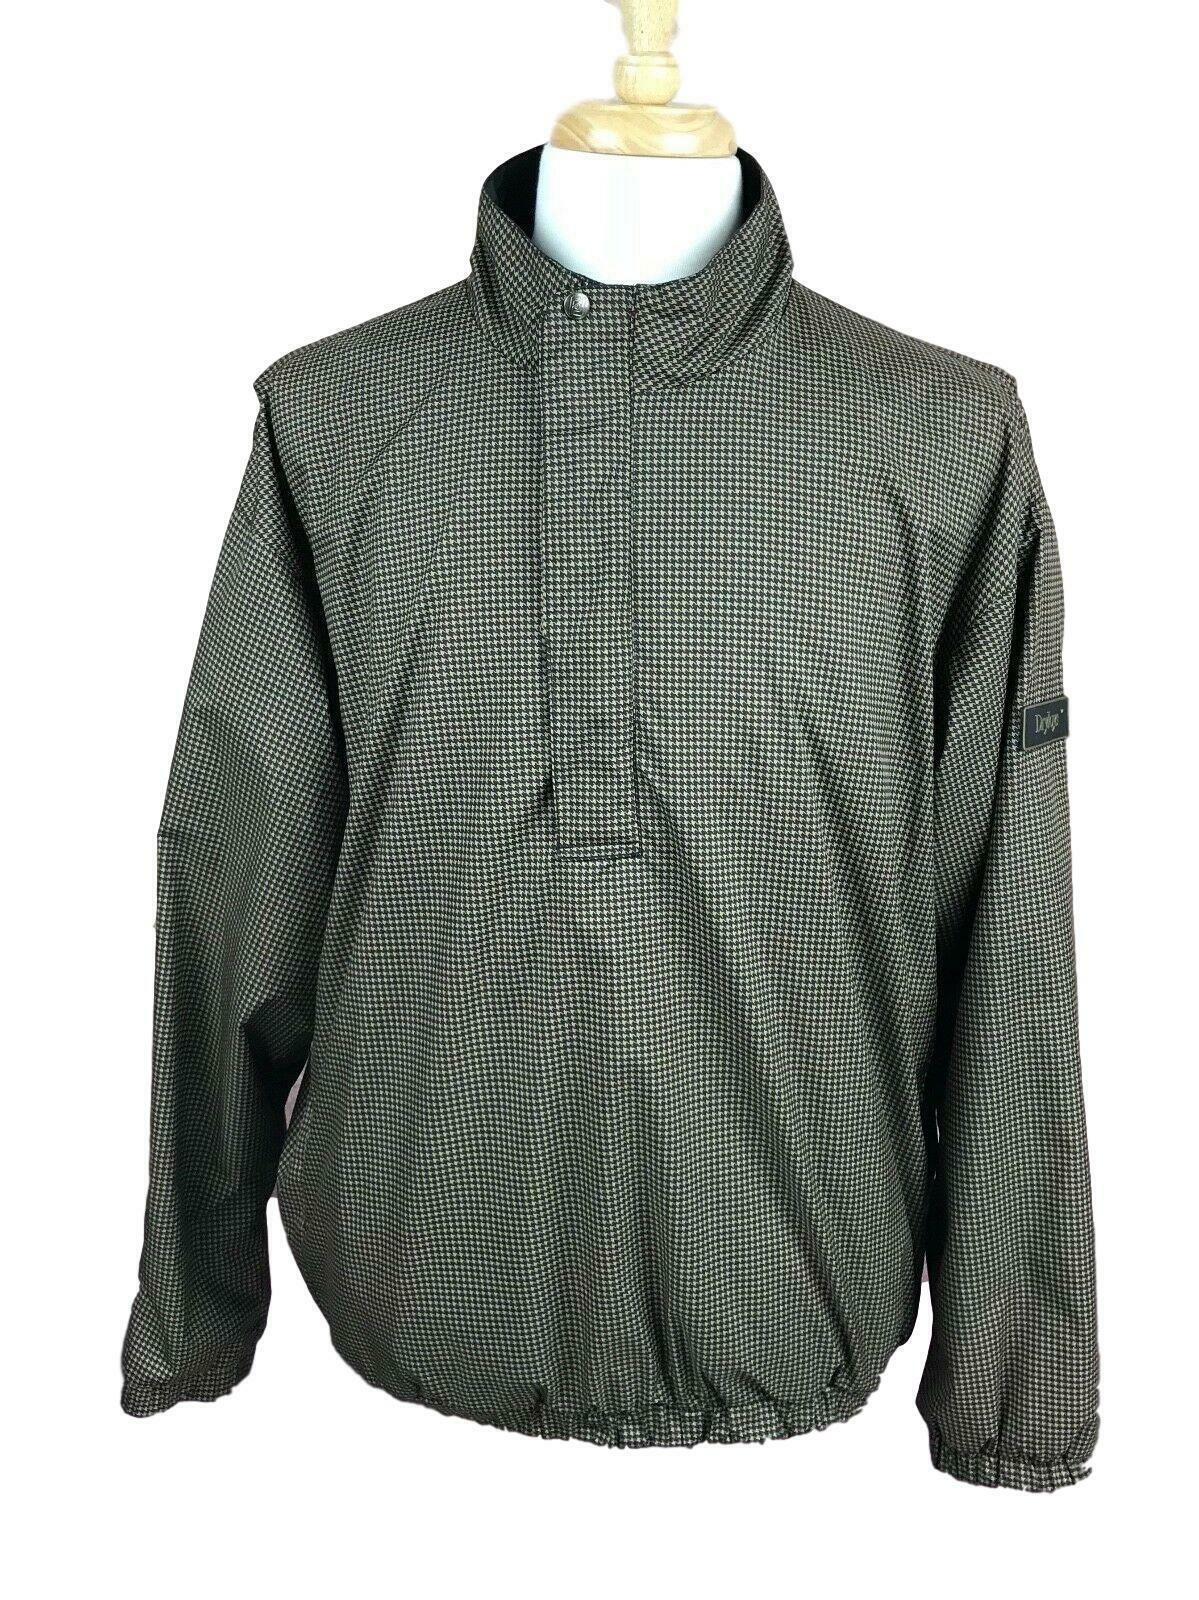 DryJoys by FootJoy Men's Golf Wind Rain Pullover Jacket Brown Black Check Large - $36.42